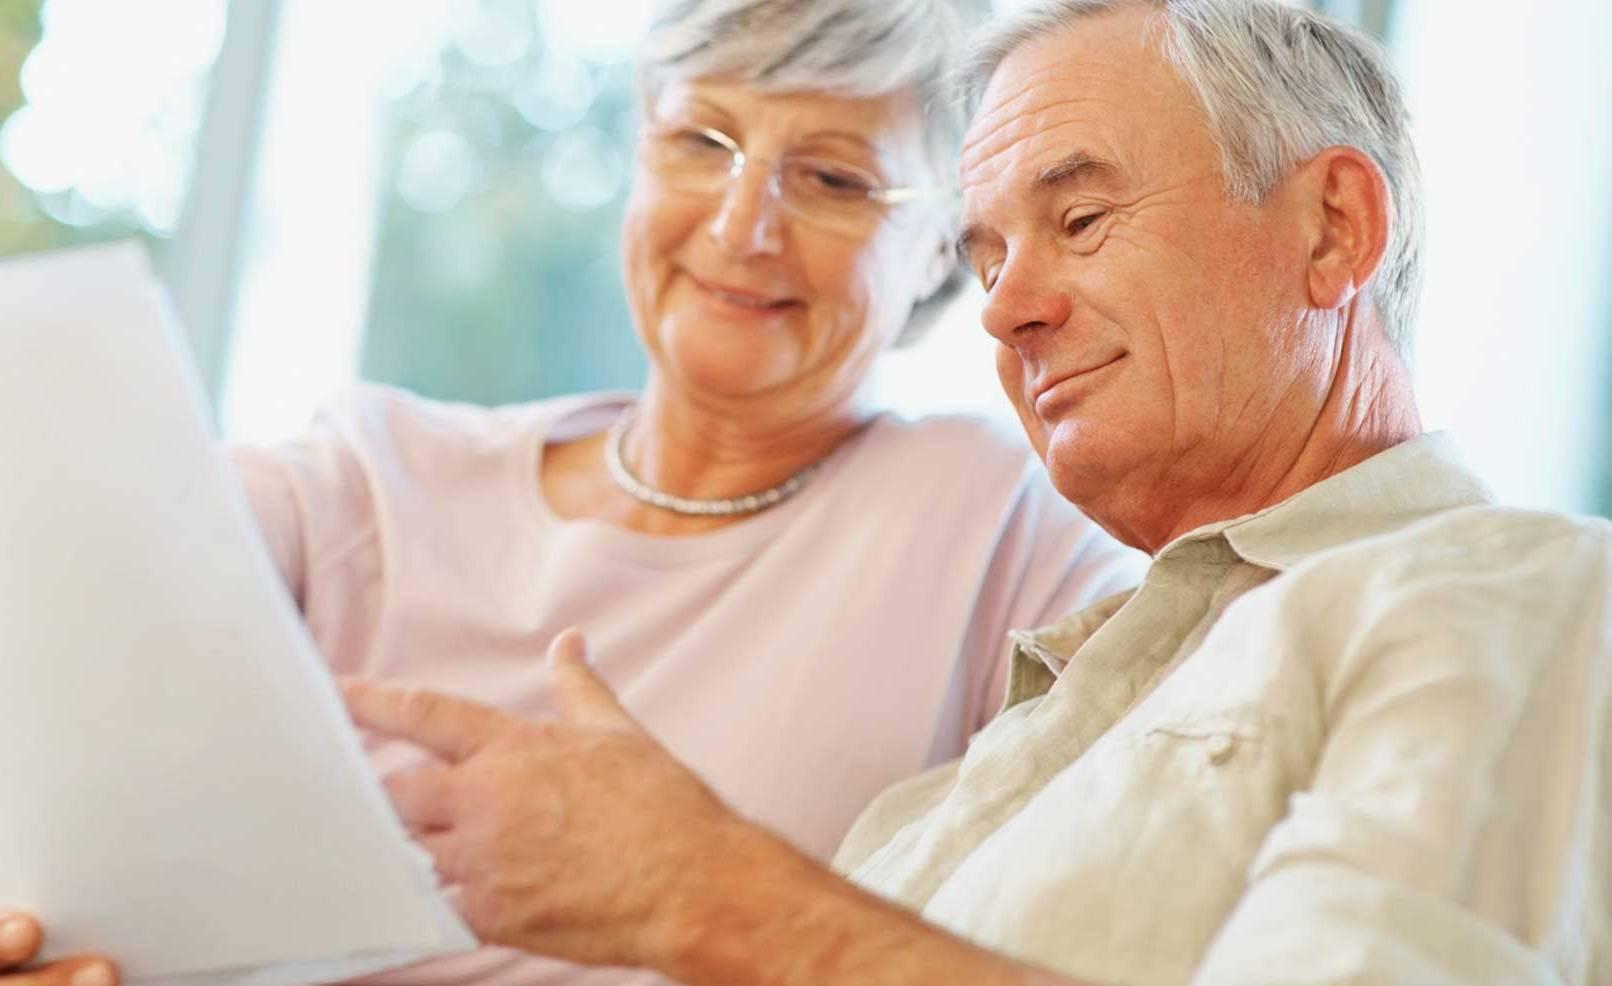 Вклады для пенсионеров на 6 месяцев